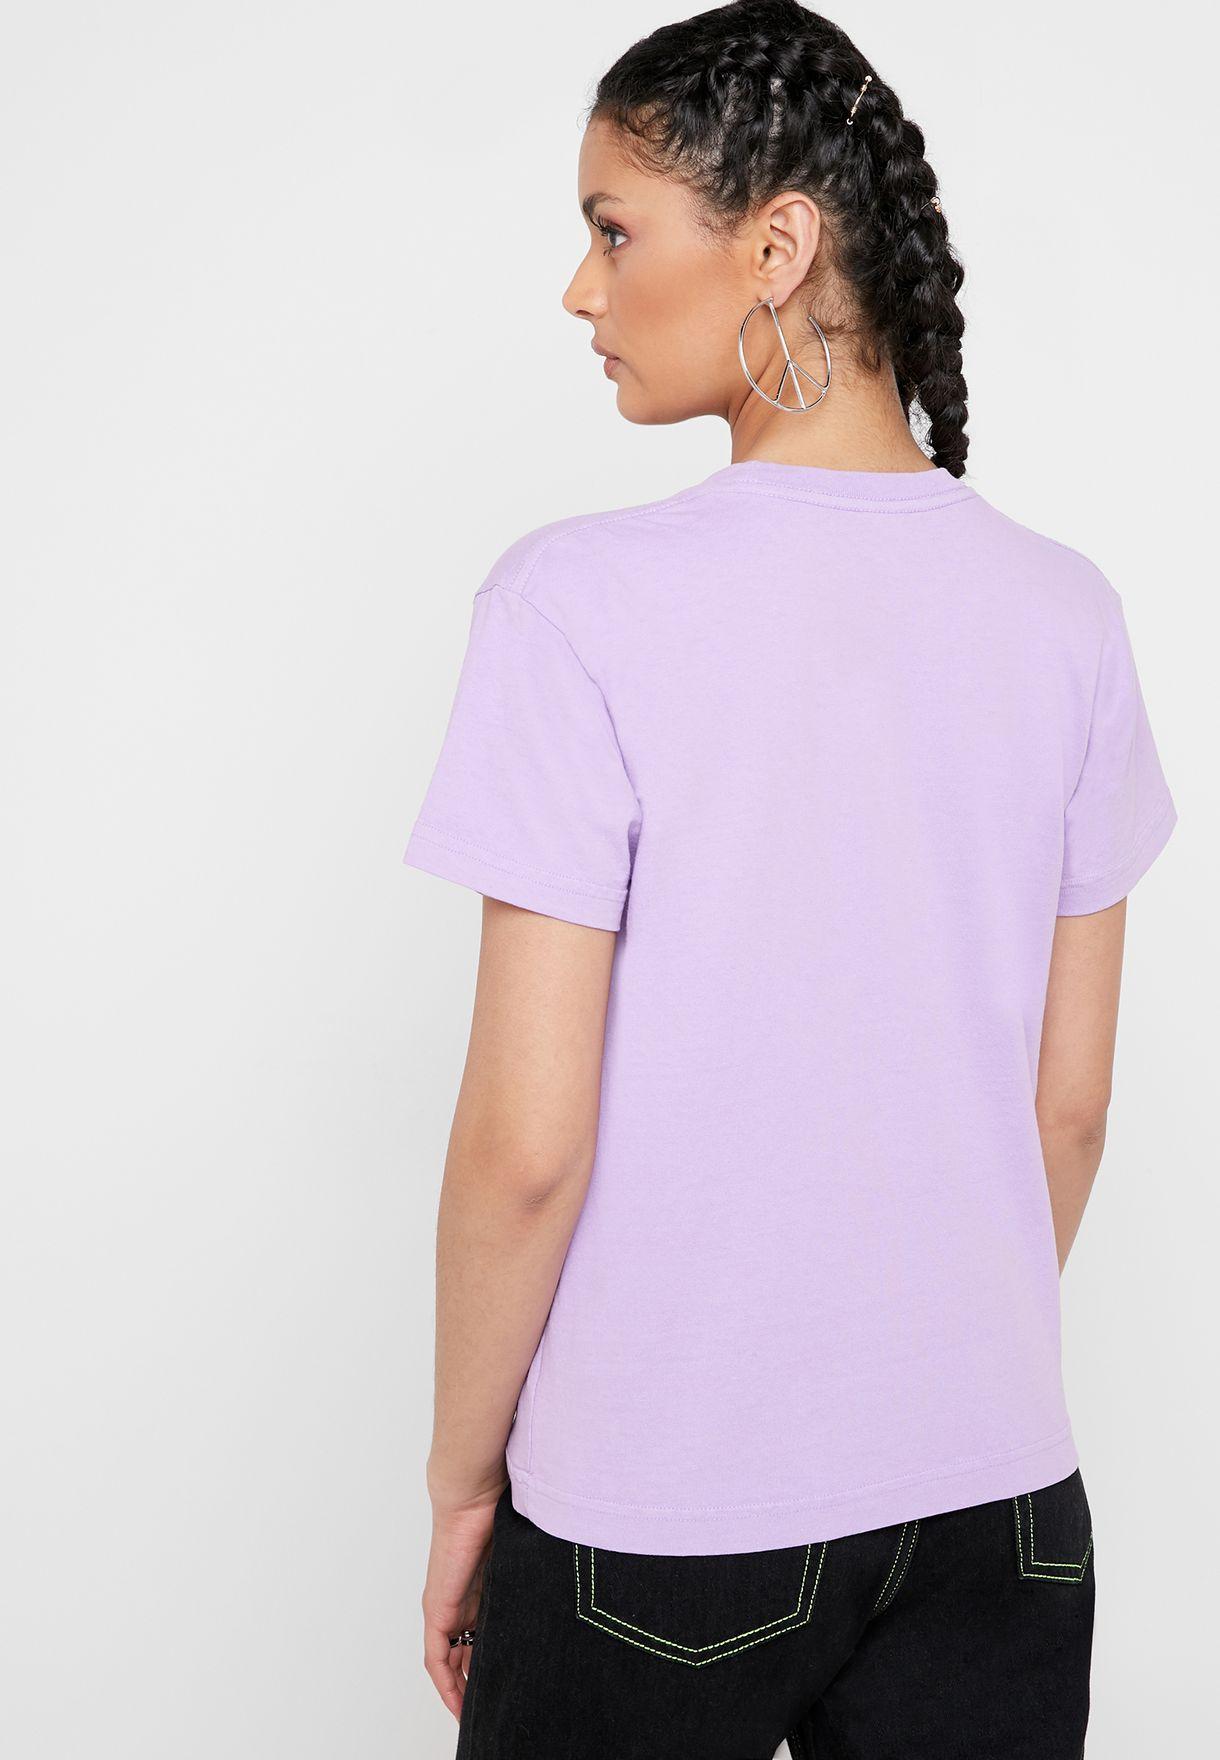 Static Future T-Shirt